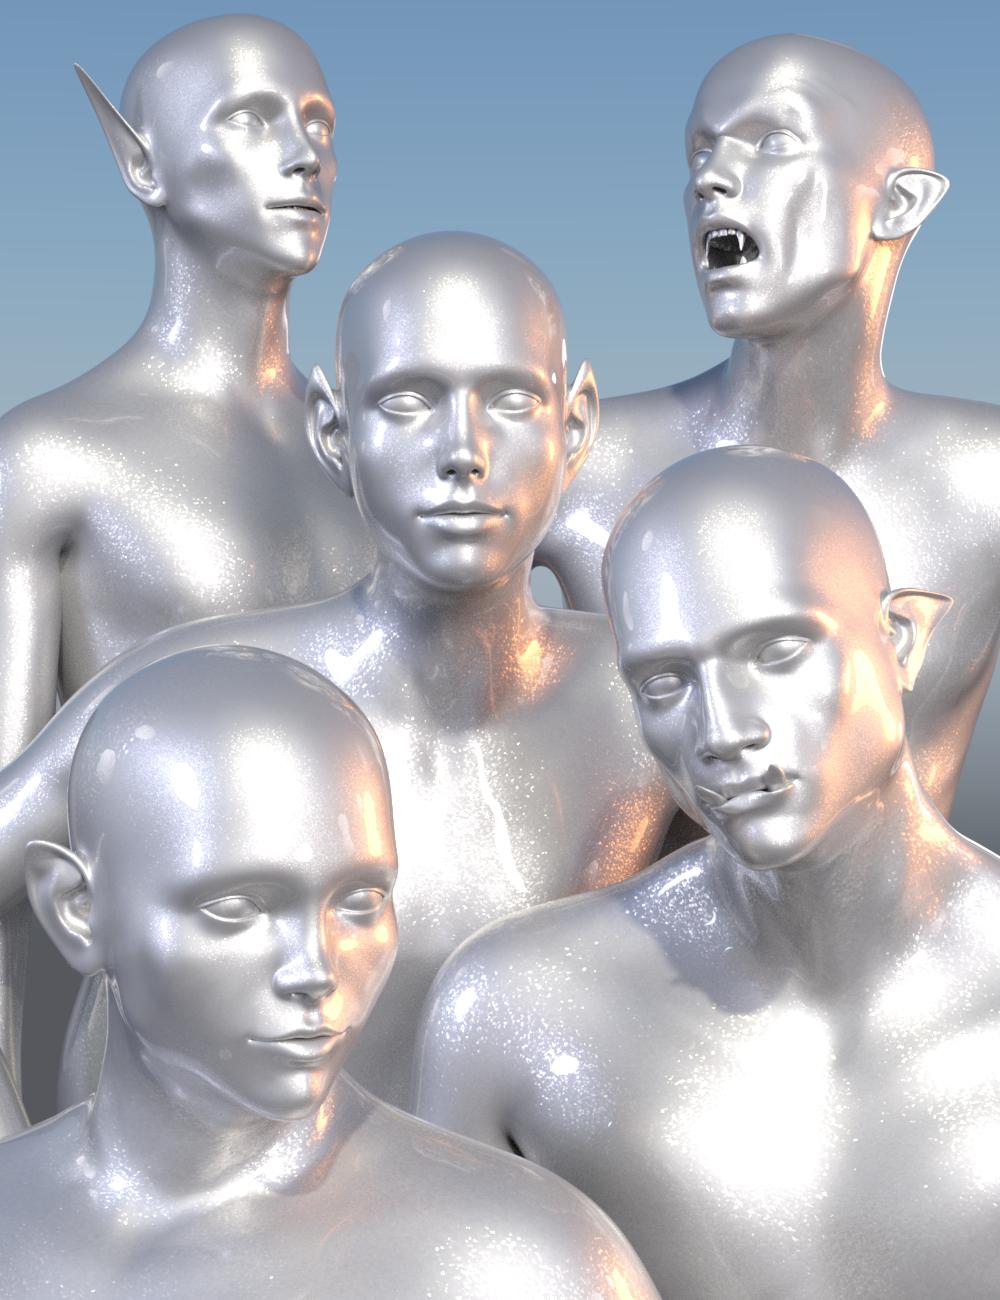 Fantastical Features Genesis 3 Male by: Sickleyield, 3D Models by Daz 3D